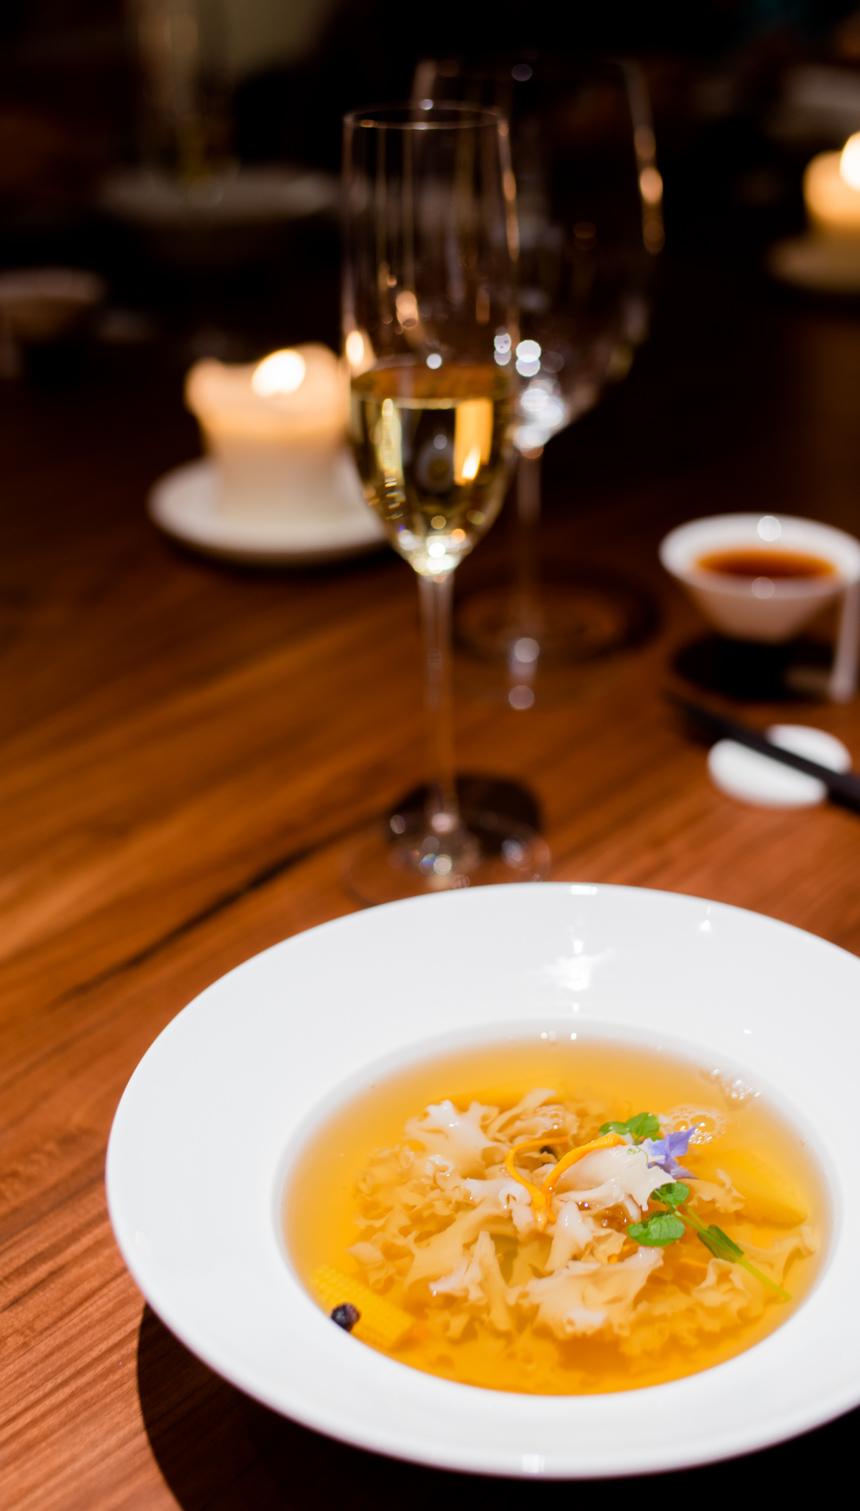 """Lotus Fungus"" (荷仙菇) soup"